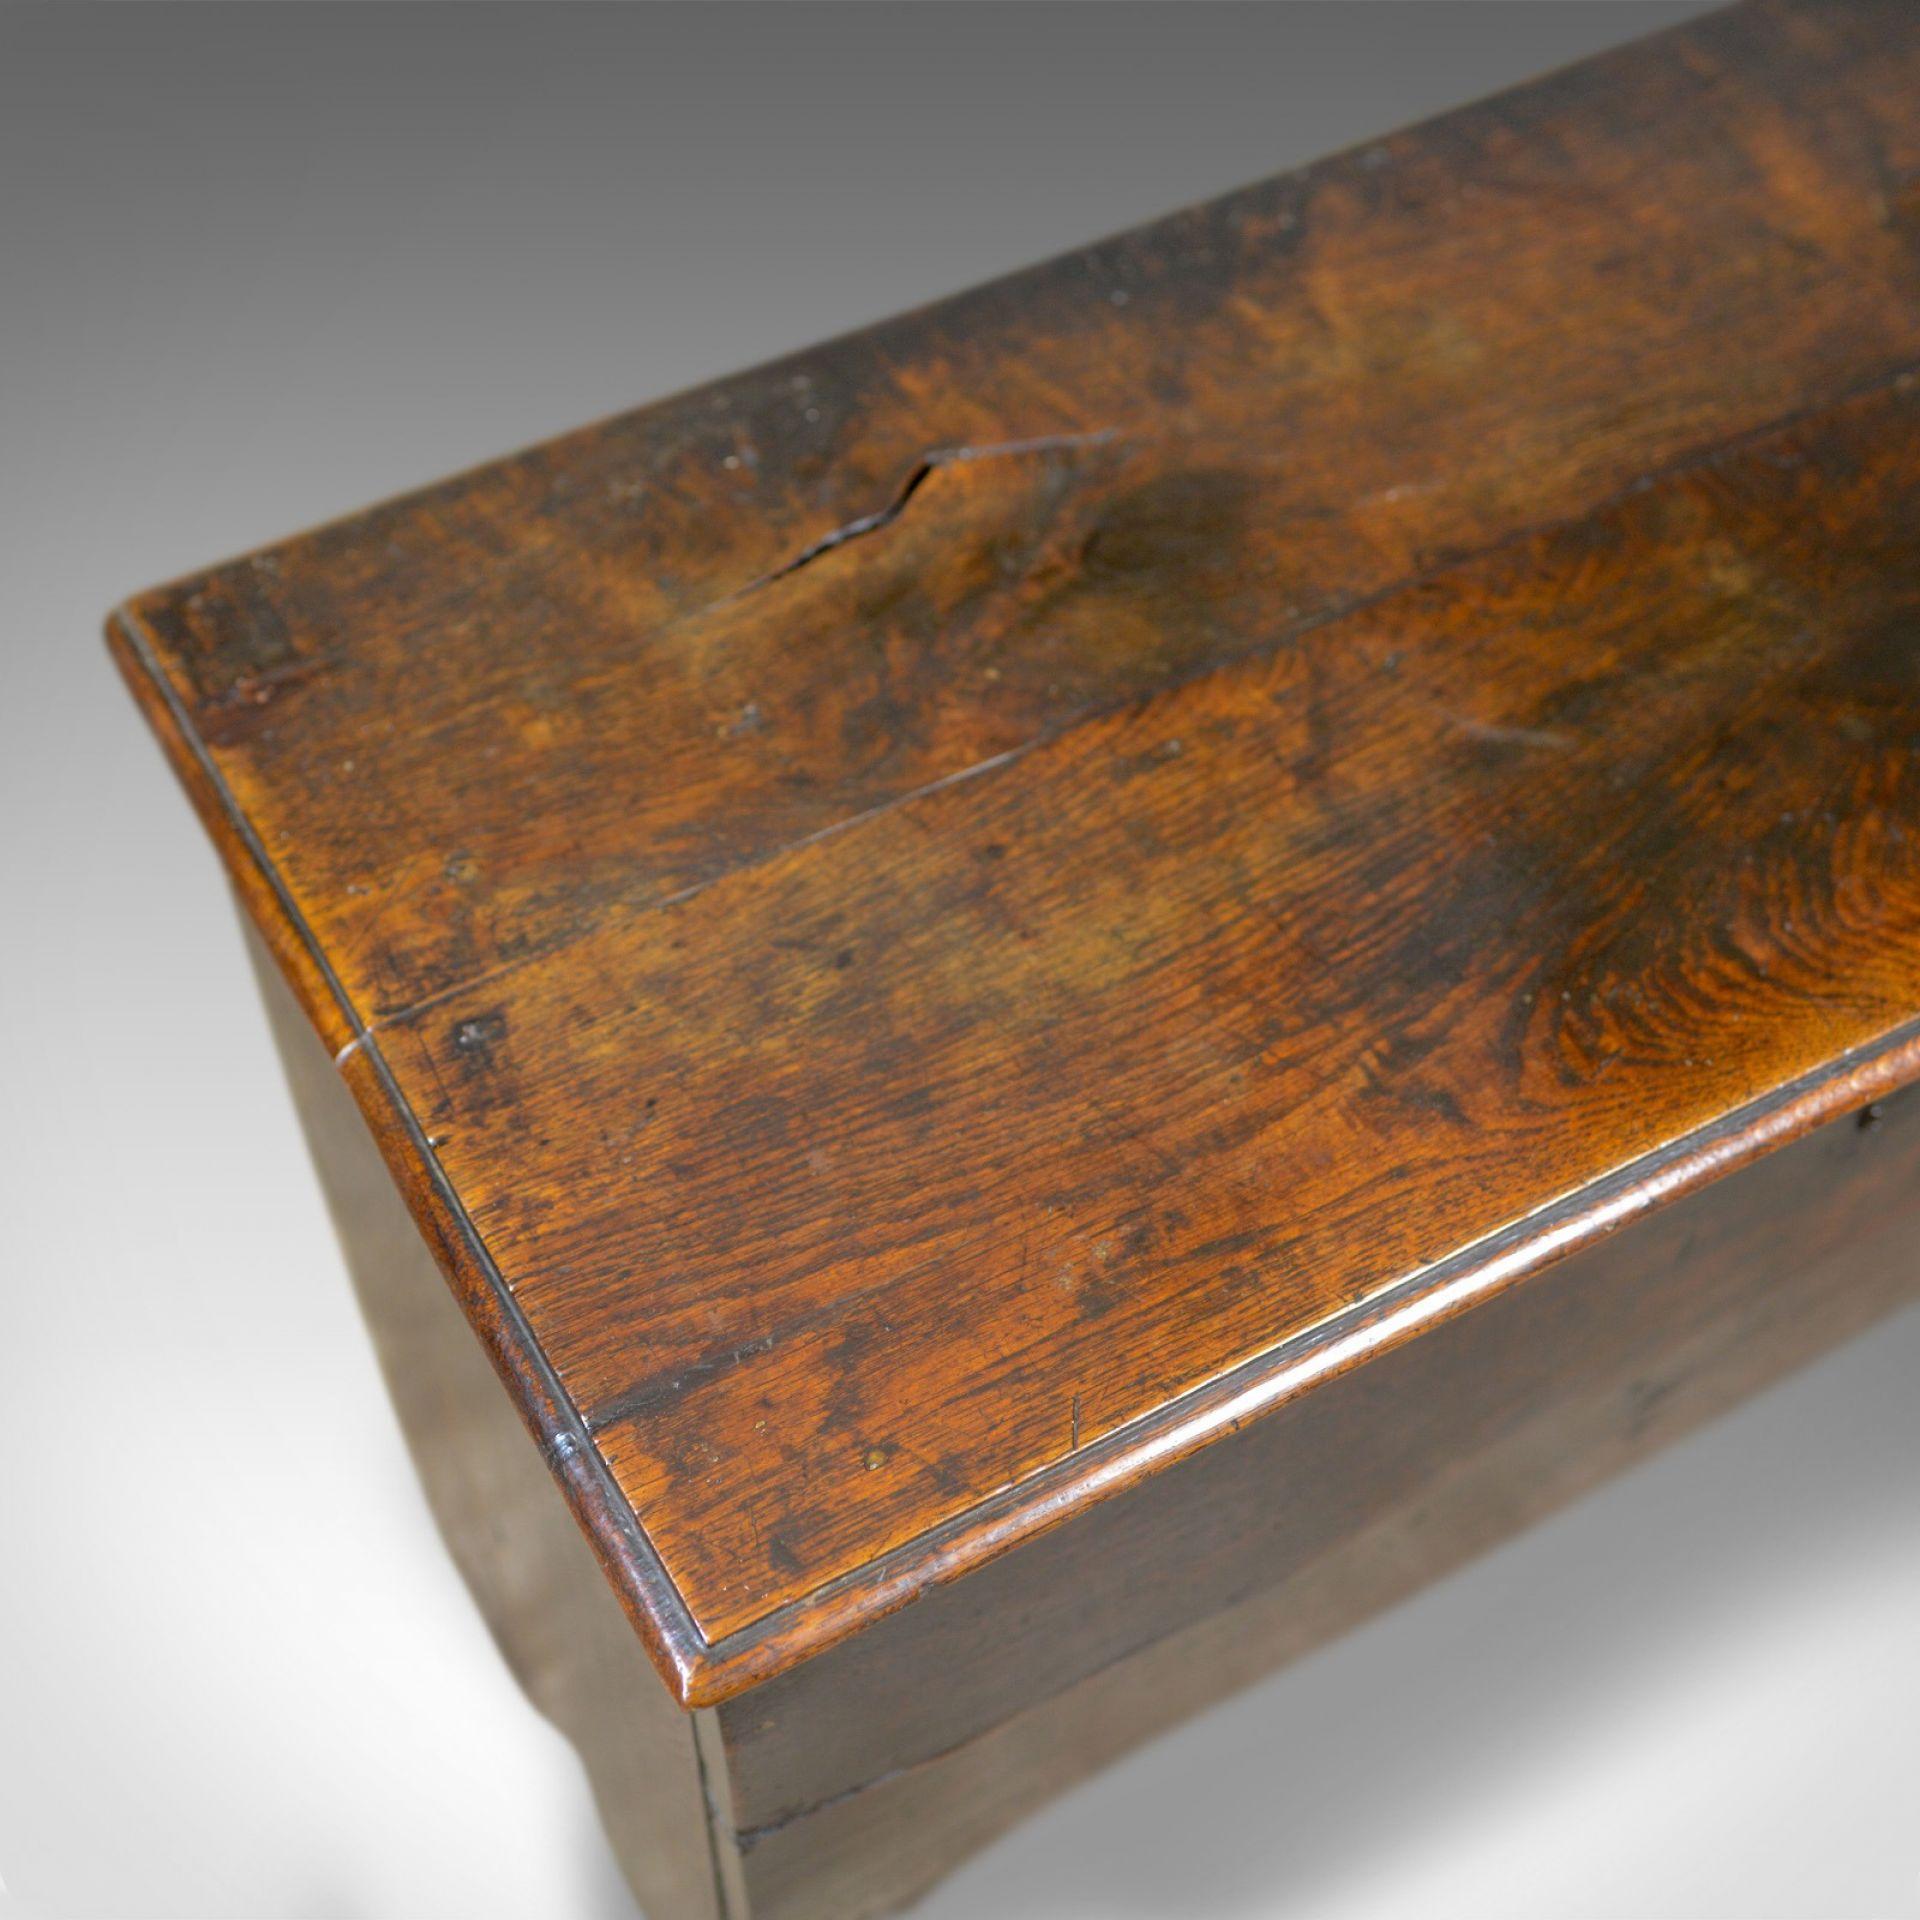 Antique Coffer, 6 Plank Sword Chest, English, Oak, 17th Century, Circa 1660